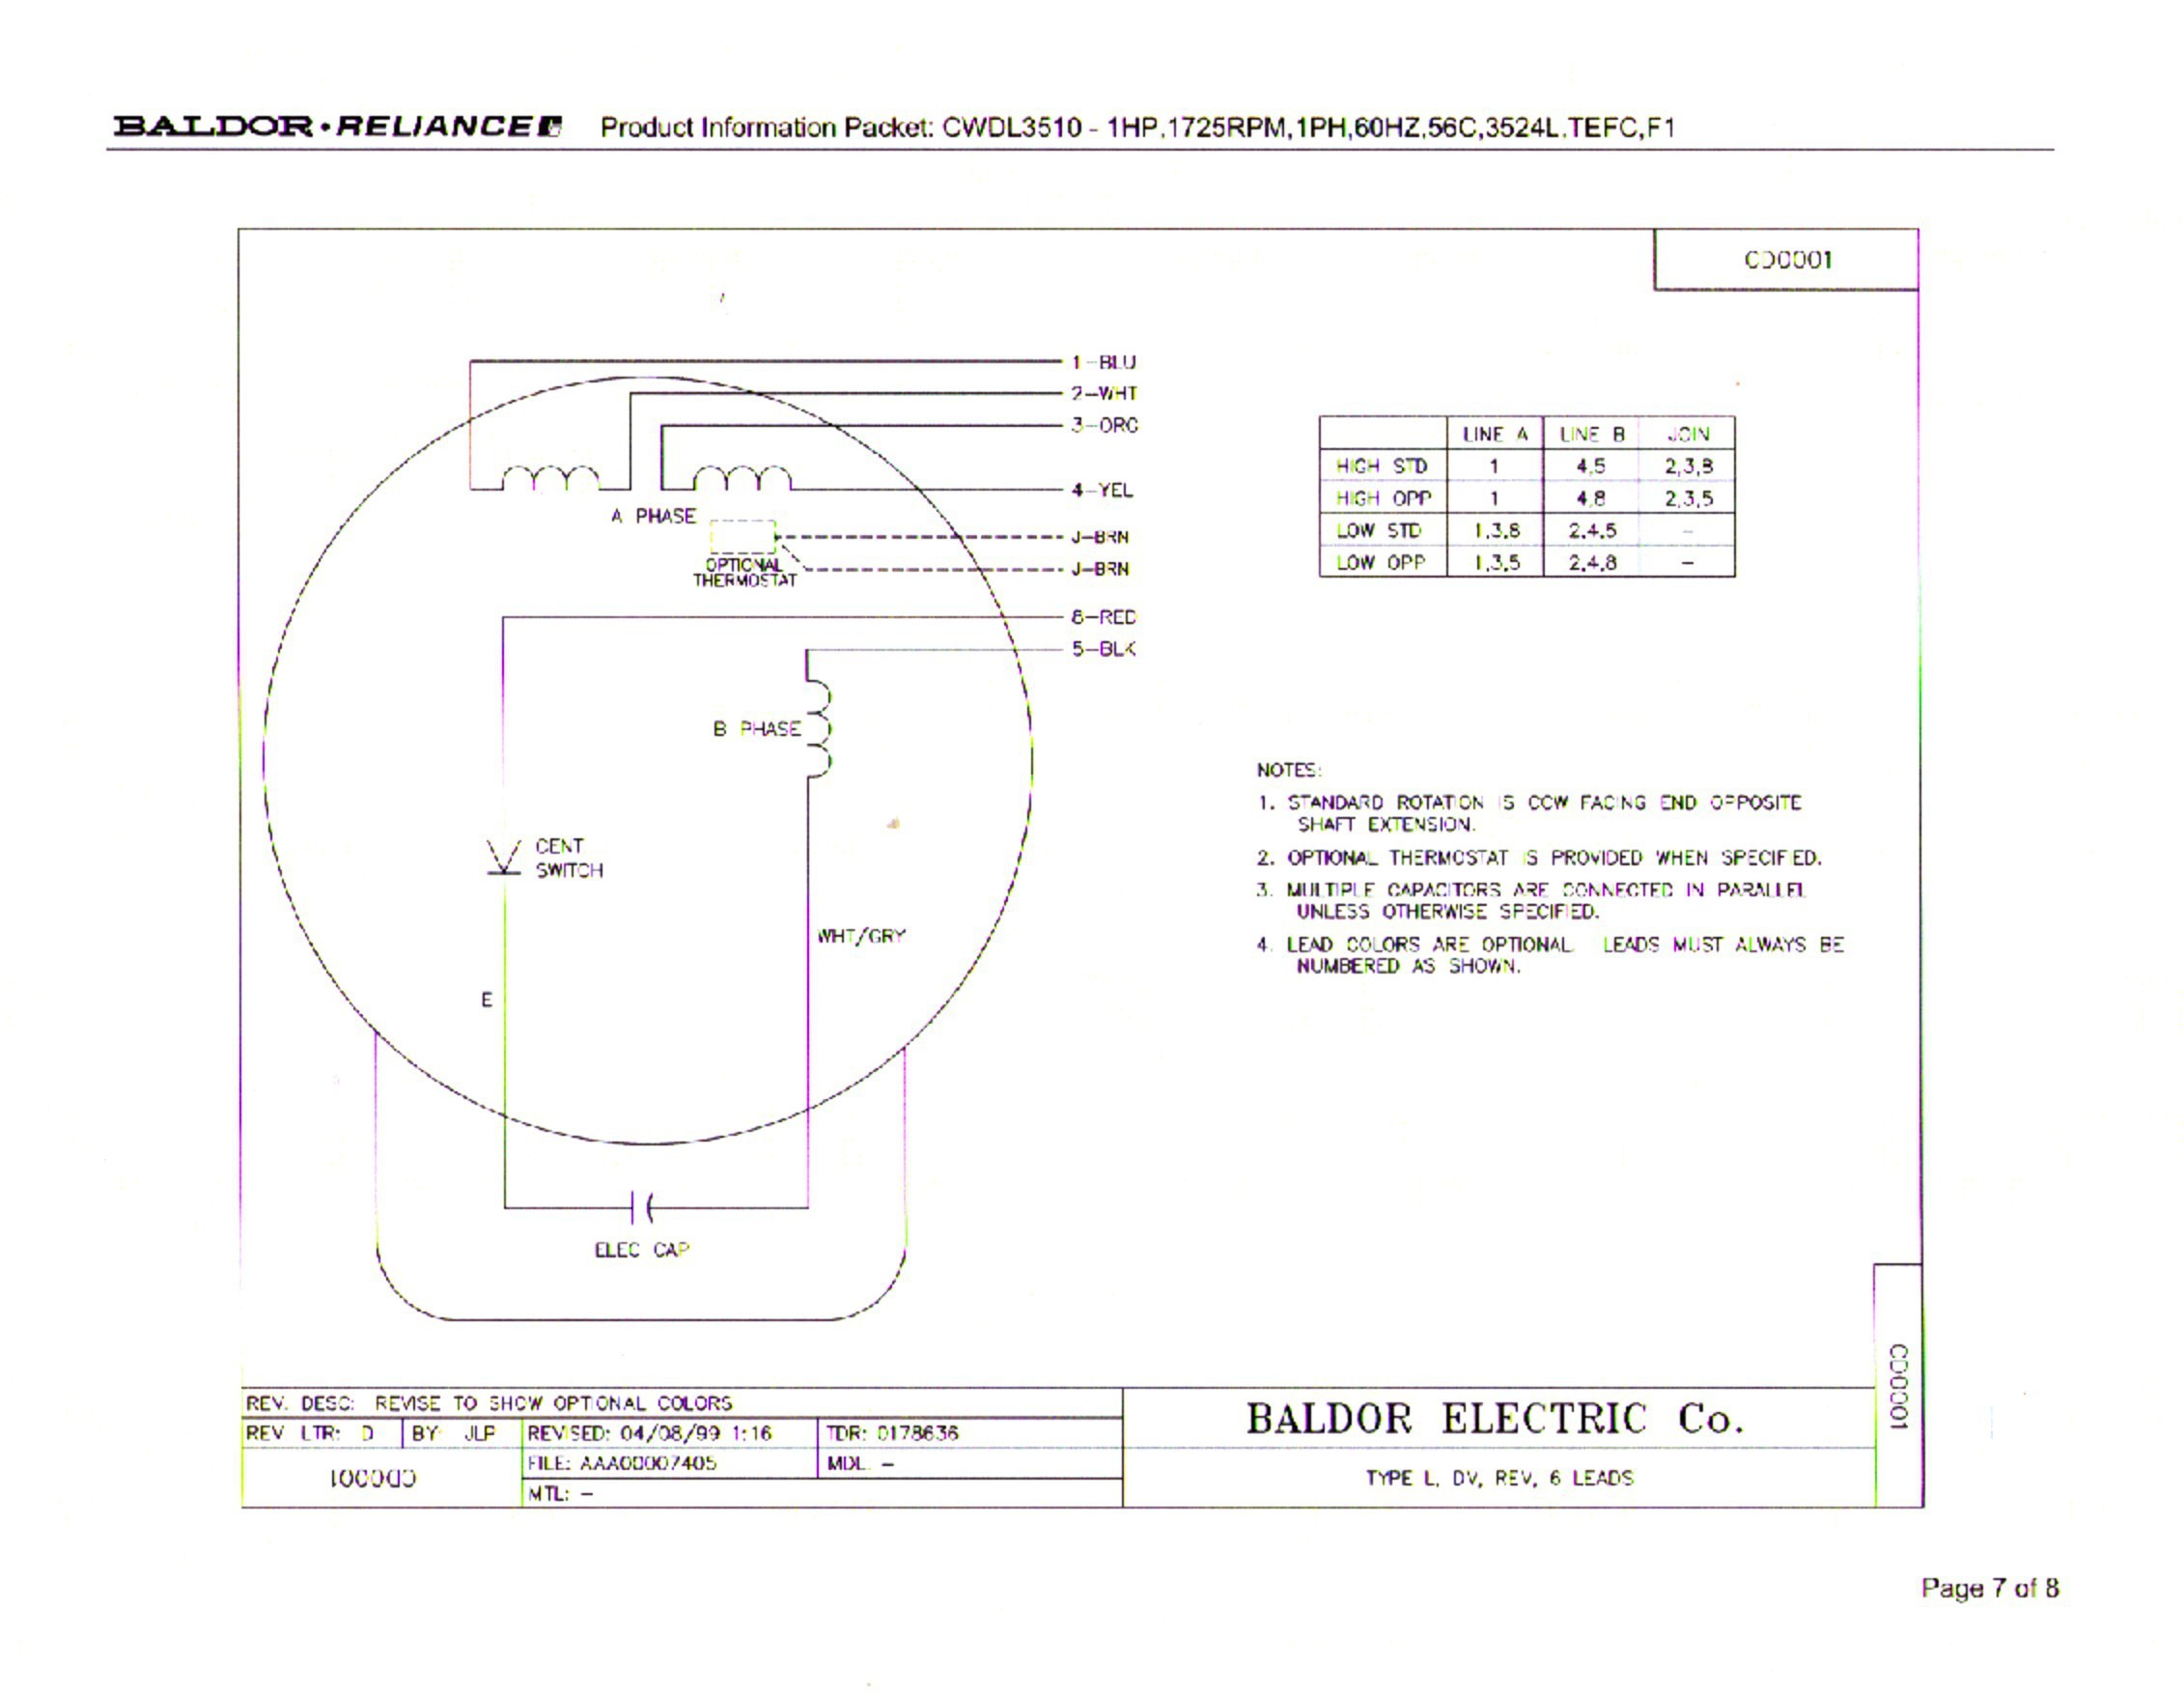 Leeson Electric Motor Wiring Diagram Amazing Dayton Electric Motor Wiring Diagram Ideas Everything You Of Leeson Electric Motor Wiring Diagram